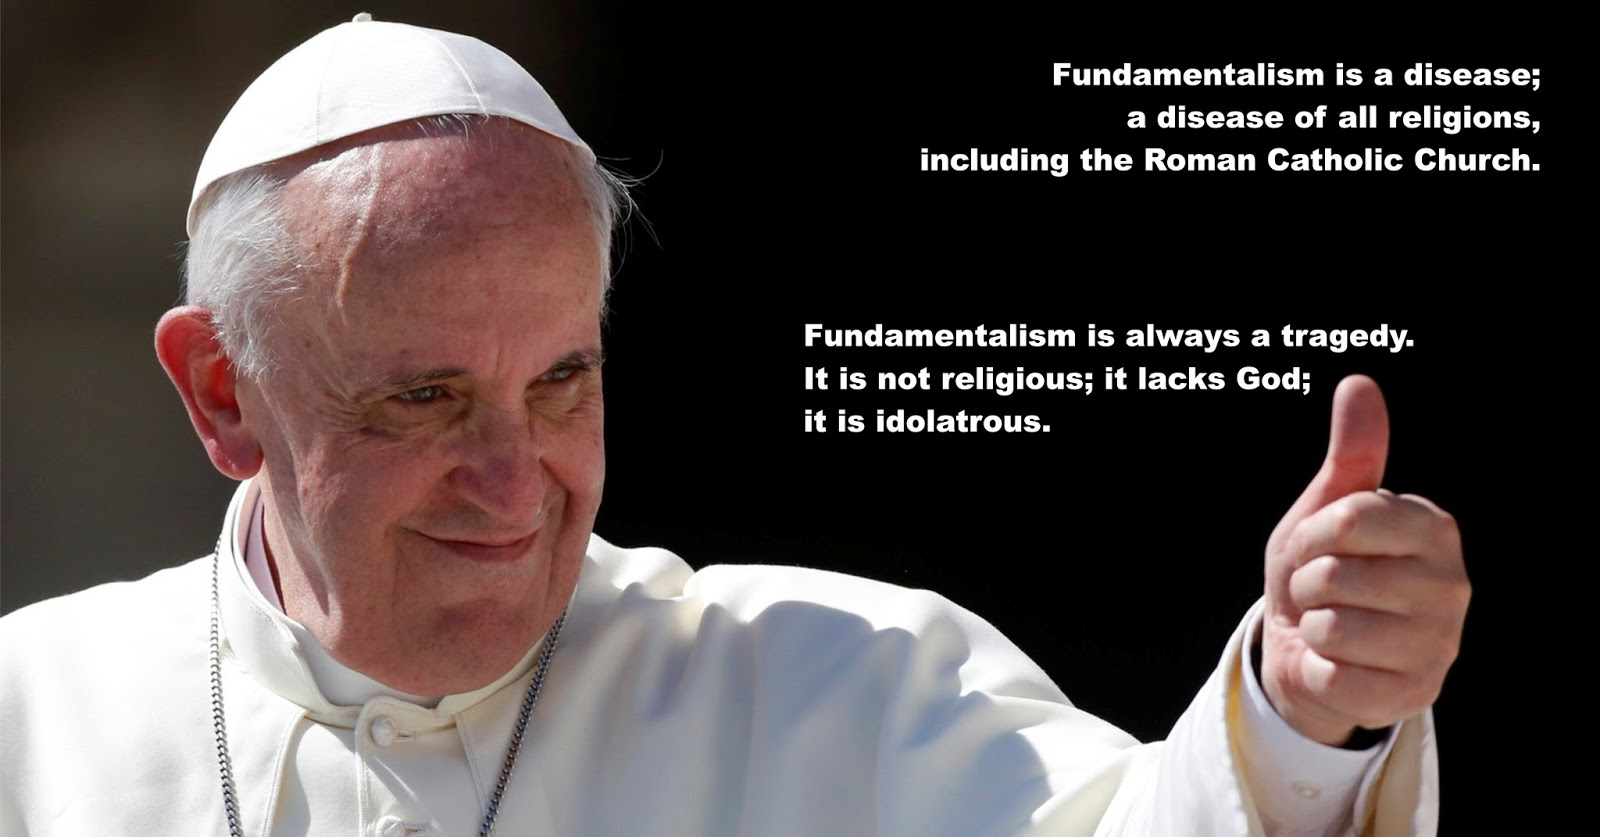 http://news.yahoo.com/pope-says-fundamentalism-disease-religions-041229589.html;_ylt=AwrXoCADNV1W52cAdhjQtDMD;_ylu=X3oDMTByb2lvbXVuBGNvbG8DZ3ExBHBvcwMxBHZ0aWQDBHNlYwNzcg--